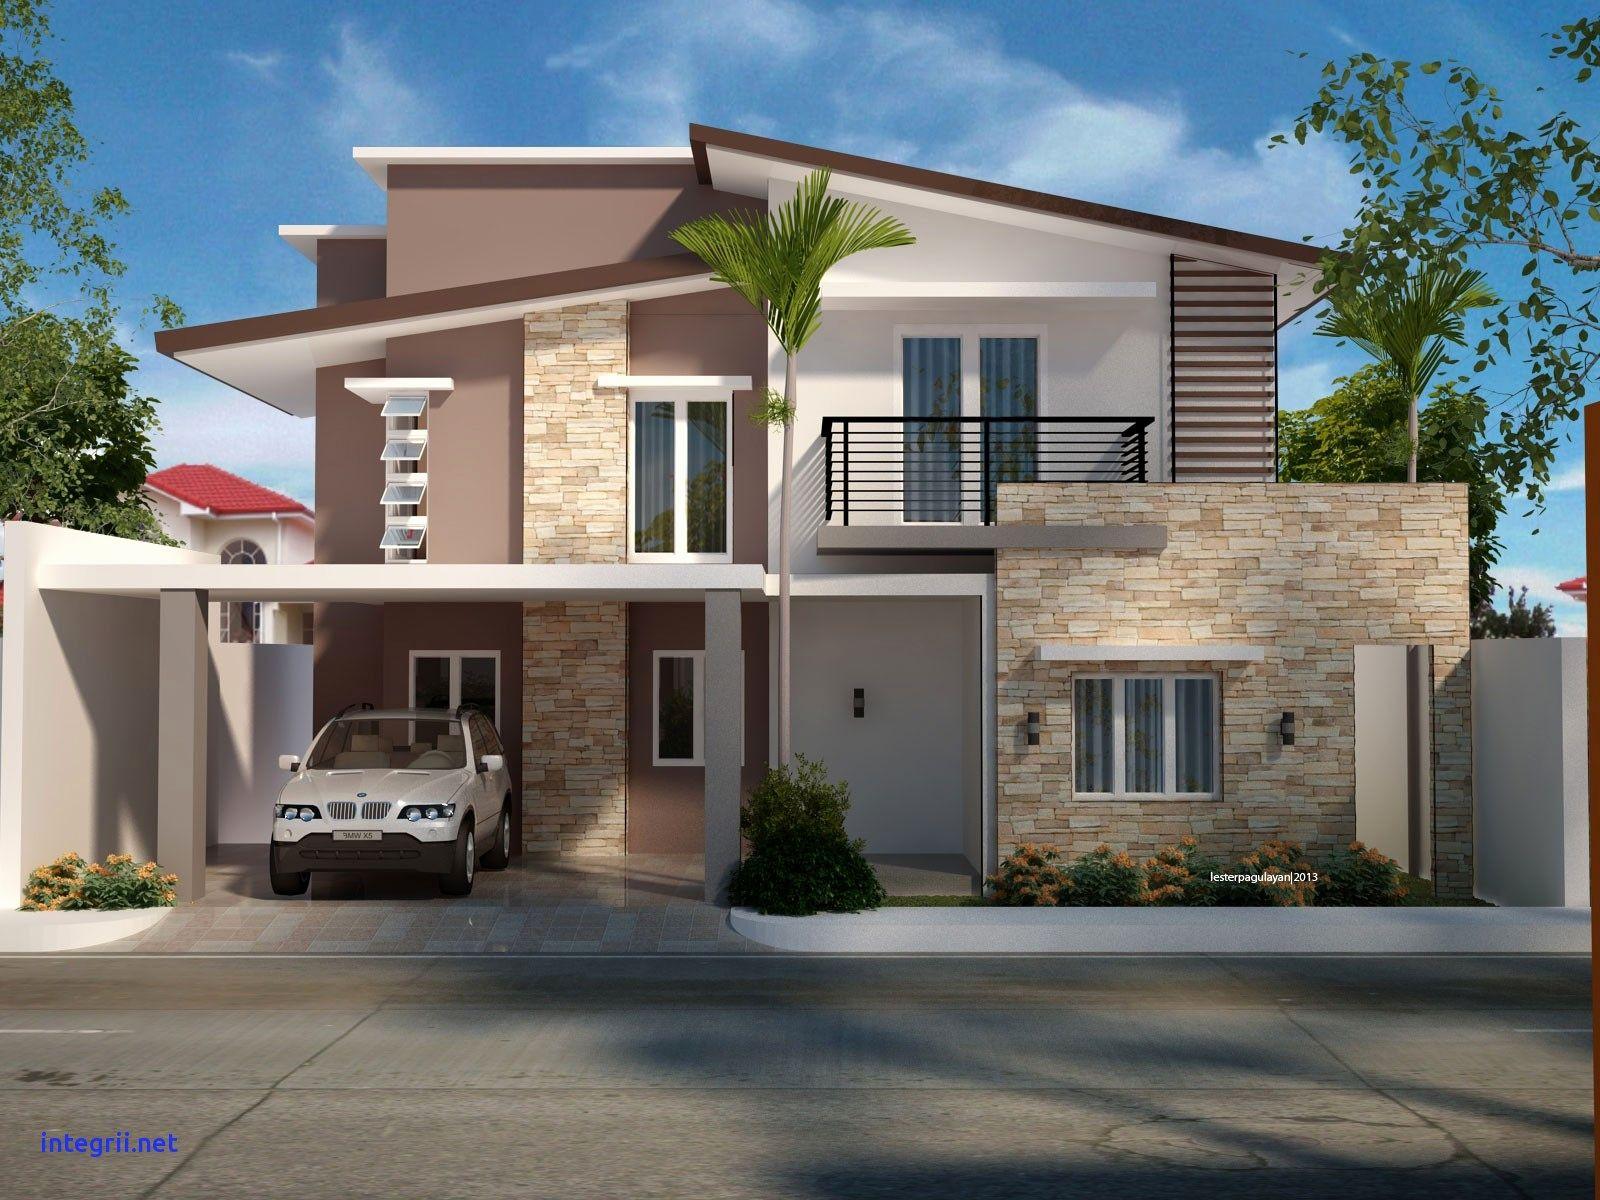 House Plans New Modern Two Story Desain Rumah Kontemporer Eksterior Rumah Modern Rumah Kontemporer